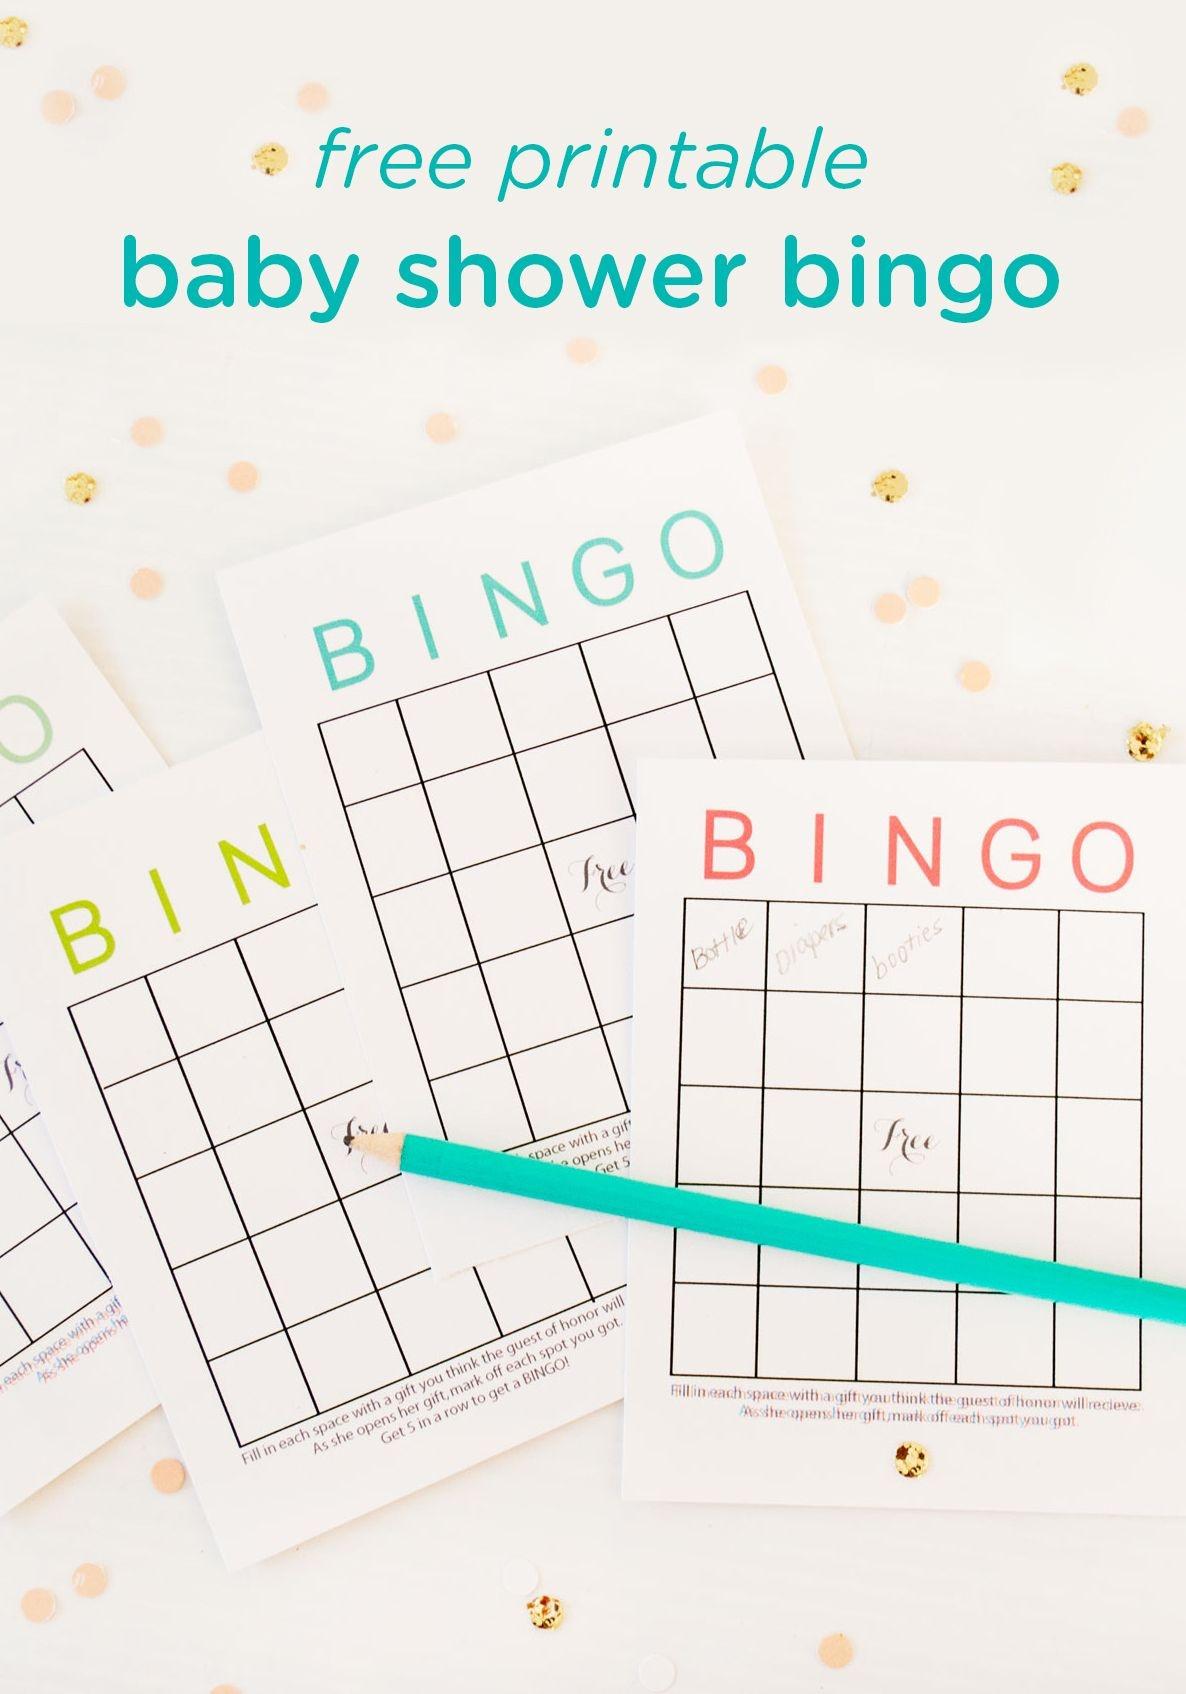 Free Printable Baby Shower Bingo Cards | Baby Shower Ideas | Baby - Free Printable Baby Shower Bingo For 50 People